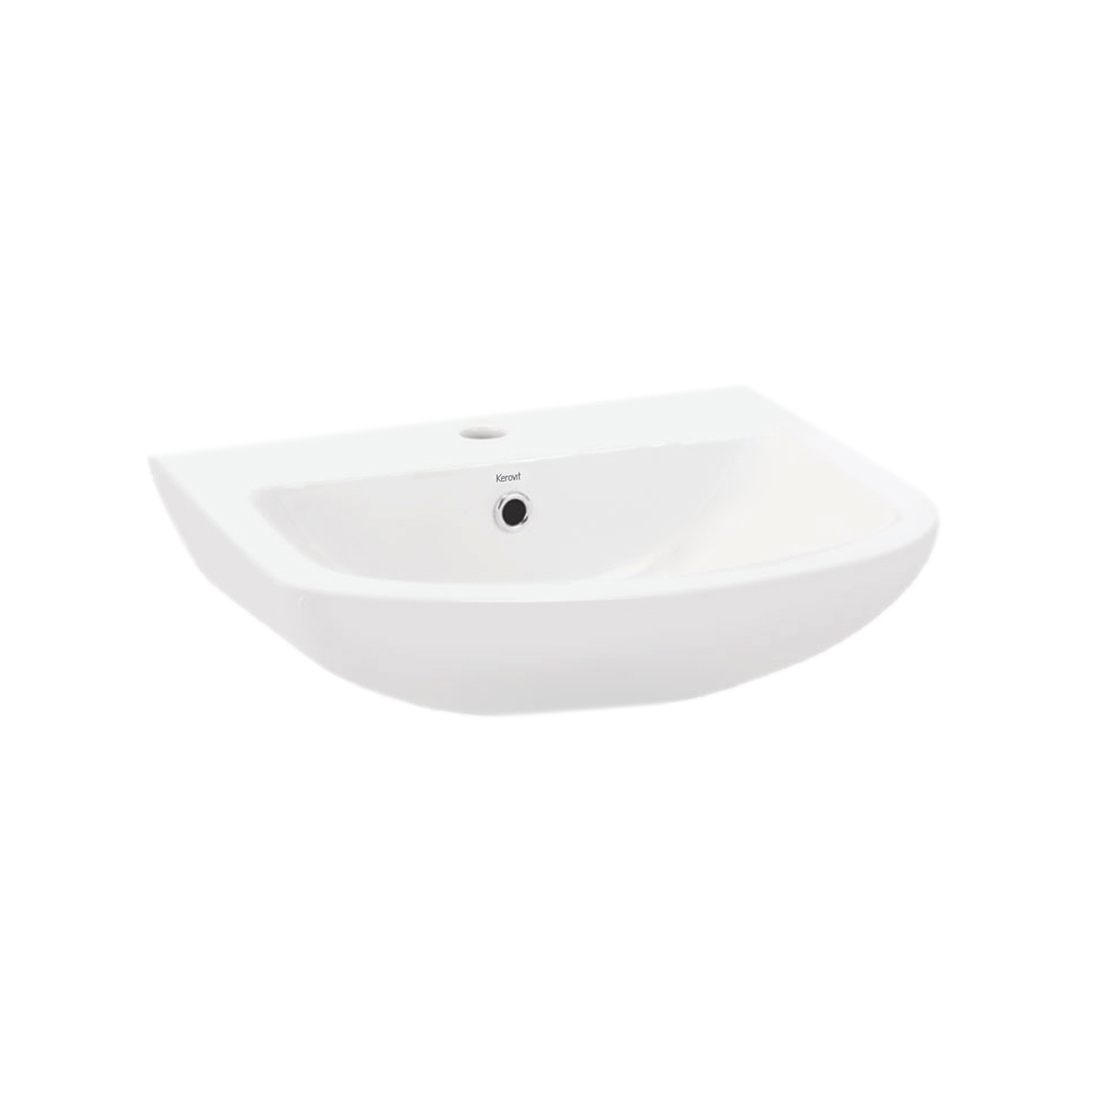 Kerovit Charlotte KS203 Wash Basin